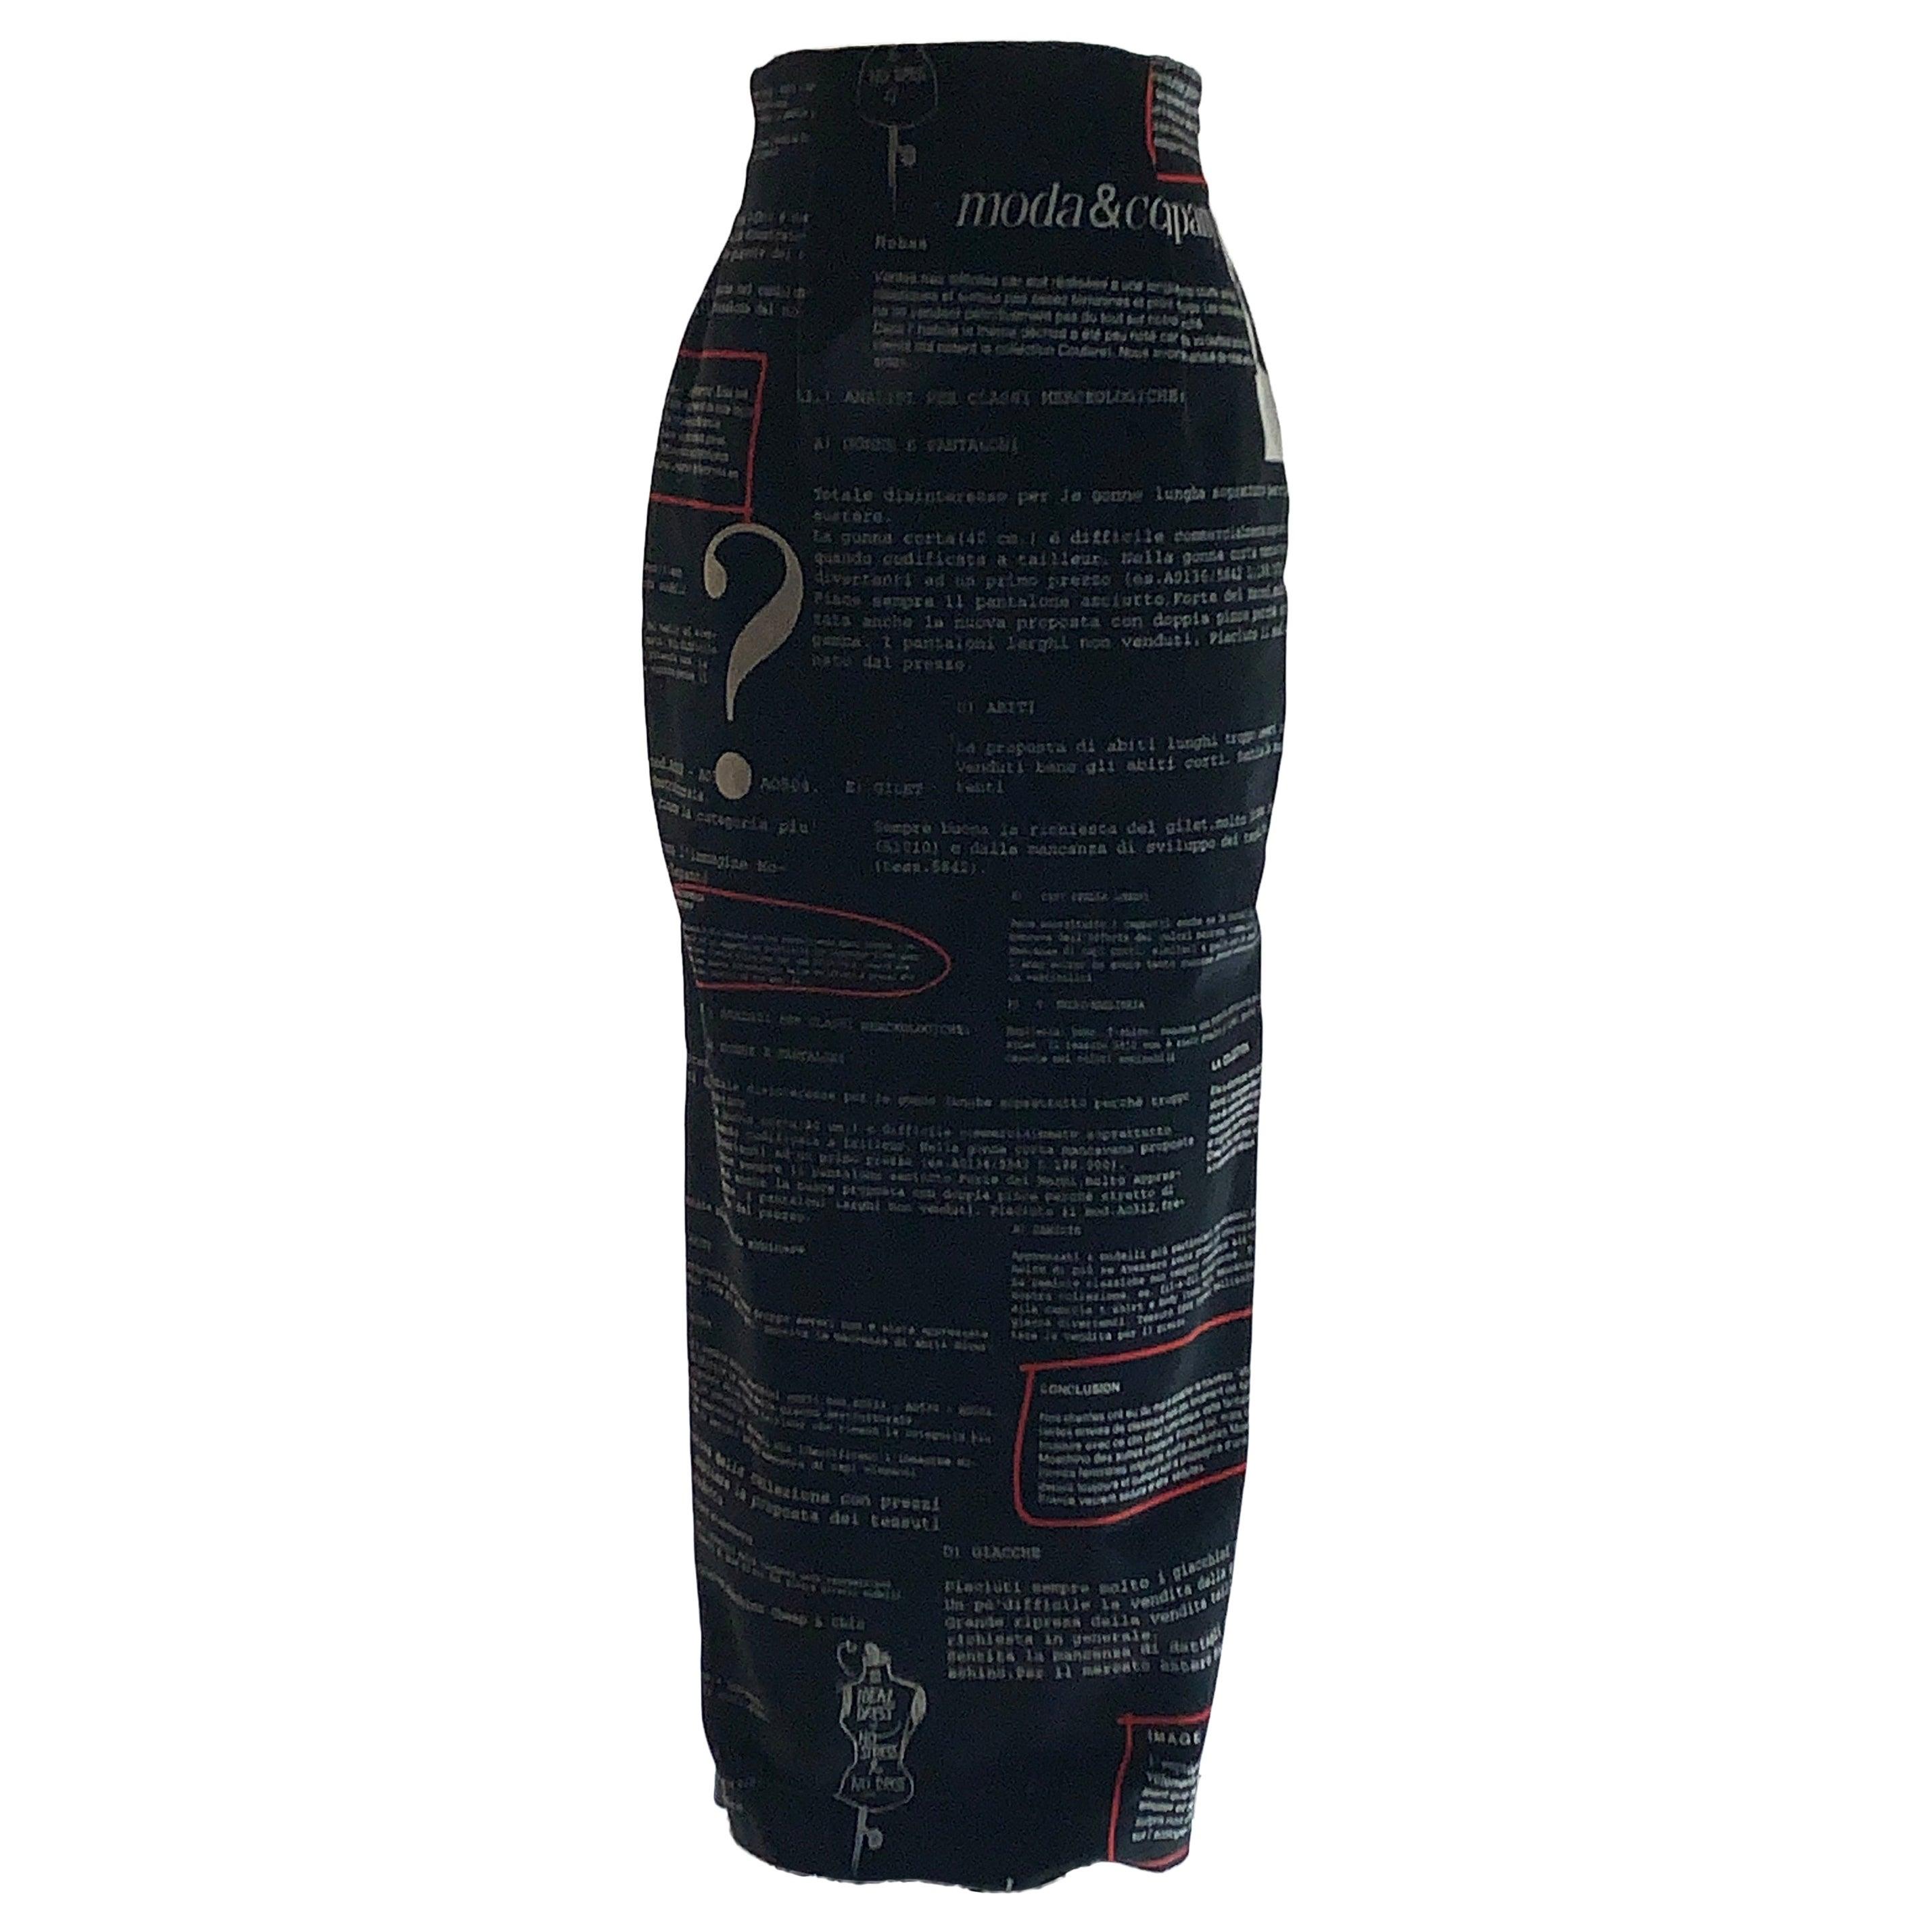 Moschino 1990s Black Velvet Italian Fashion Text Maxi Skirt